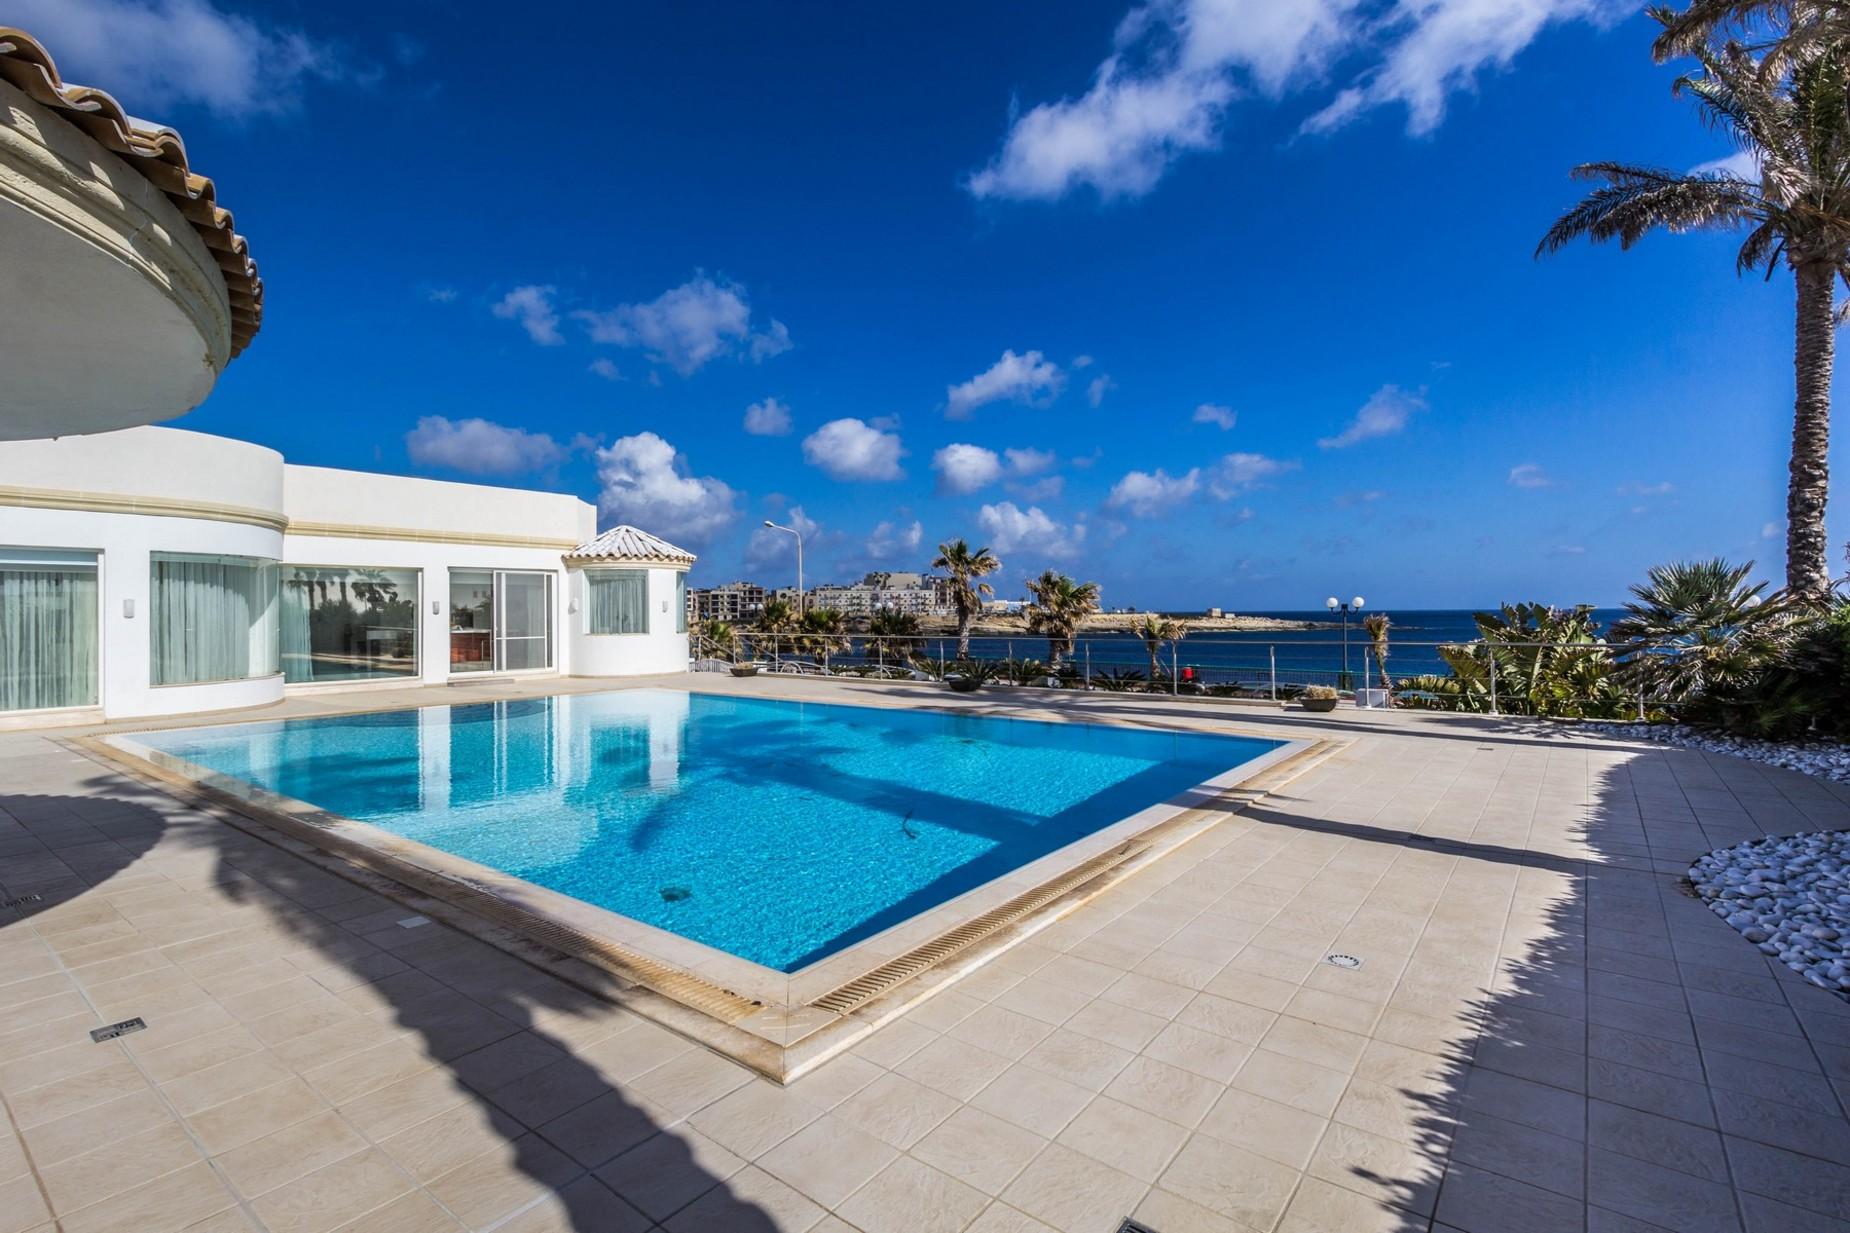 4 bed Villa For Rent in Marsascala, Marsascala - thumb 2